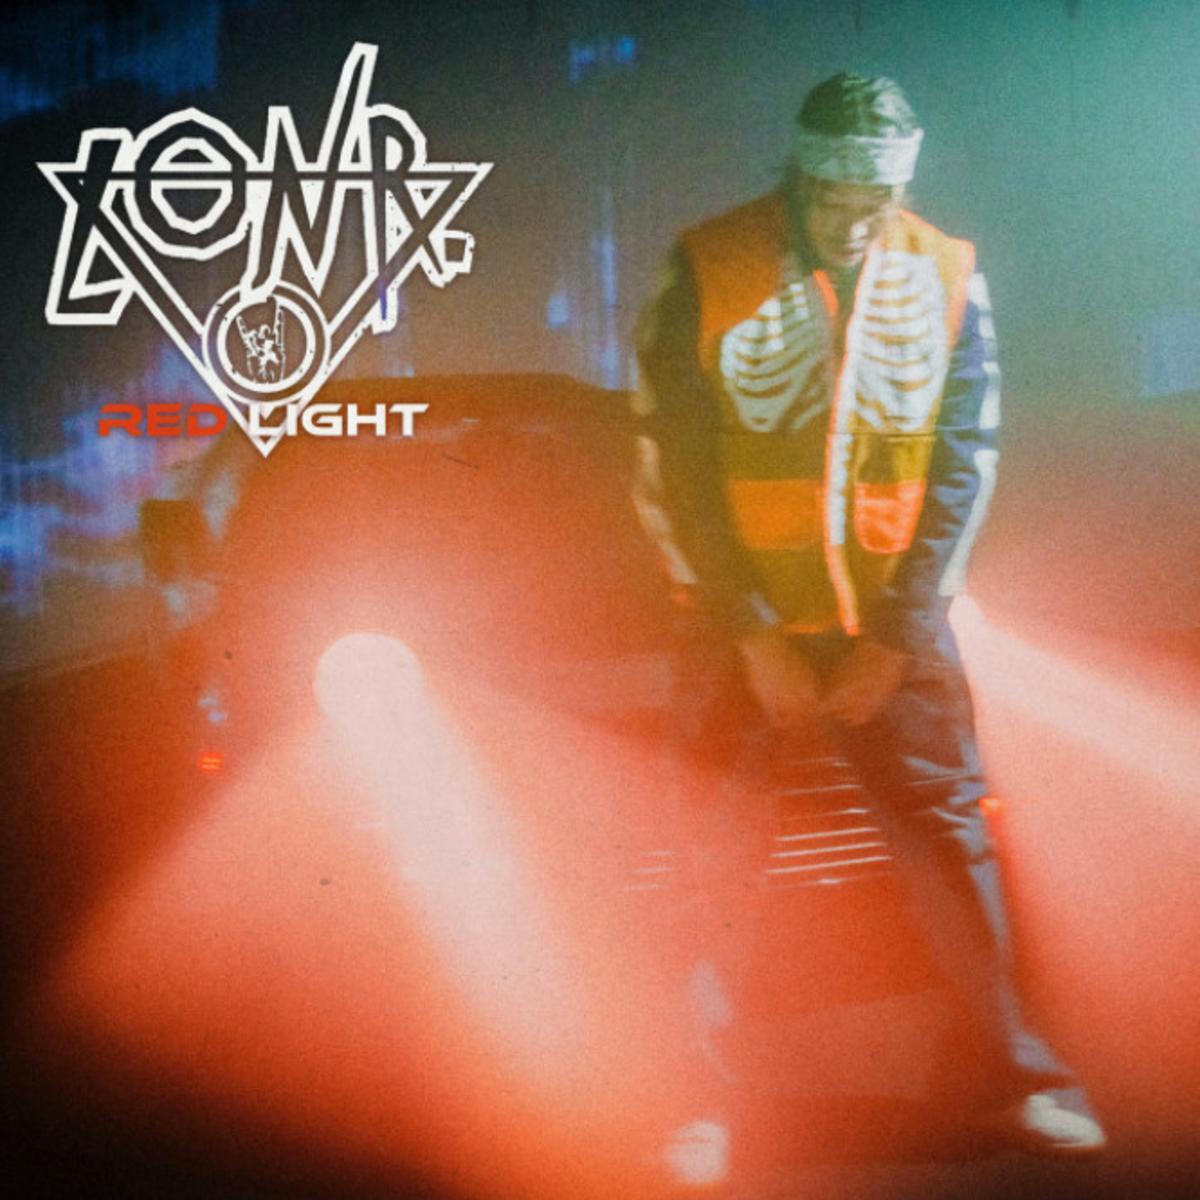 MP3: Lonr. - Red Light